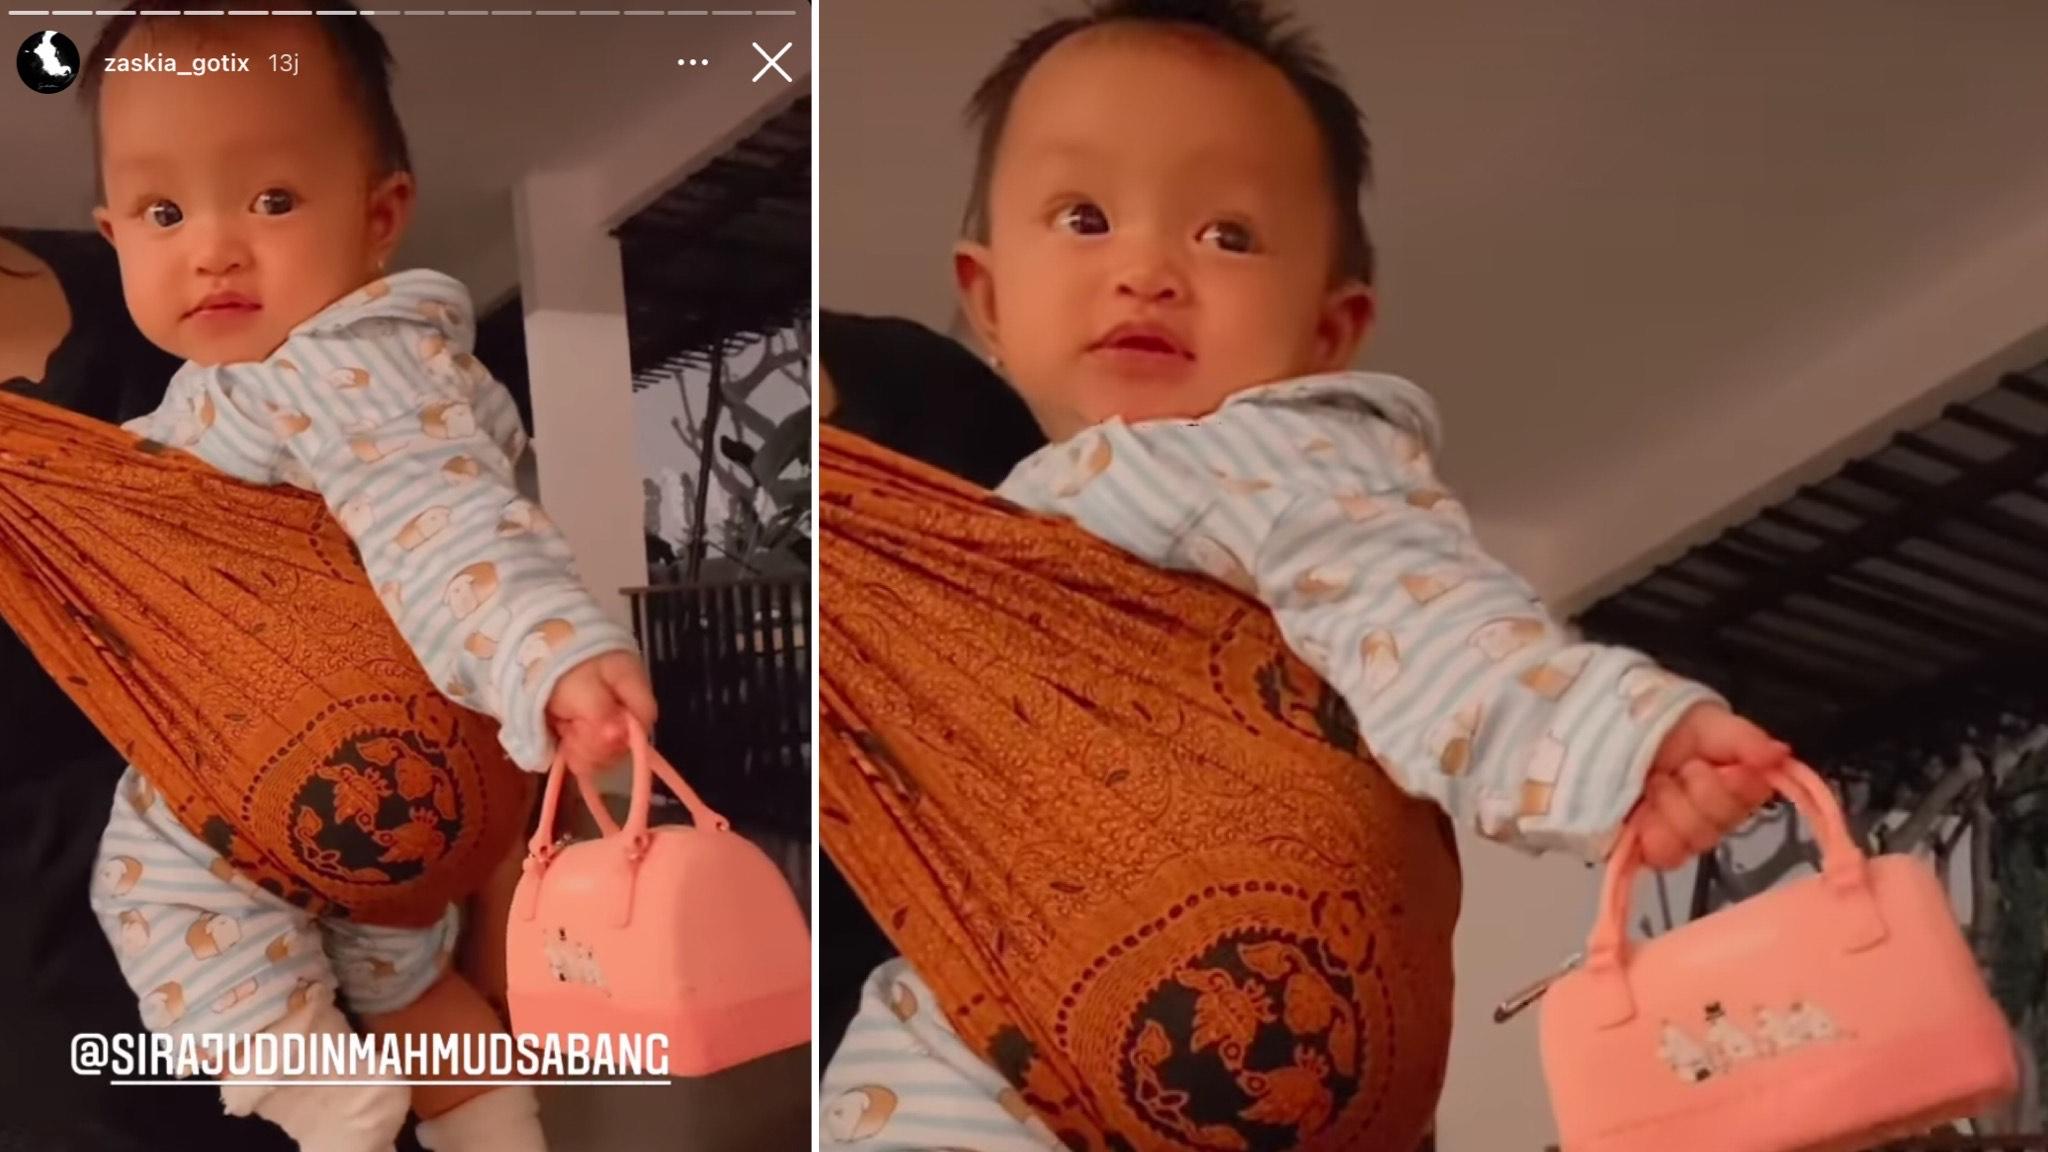 Kolase foto Arsila Bungalia Sirkiani anak Zaskia Gotik dan Sirajuddin jinjing tas mini